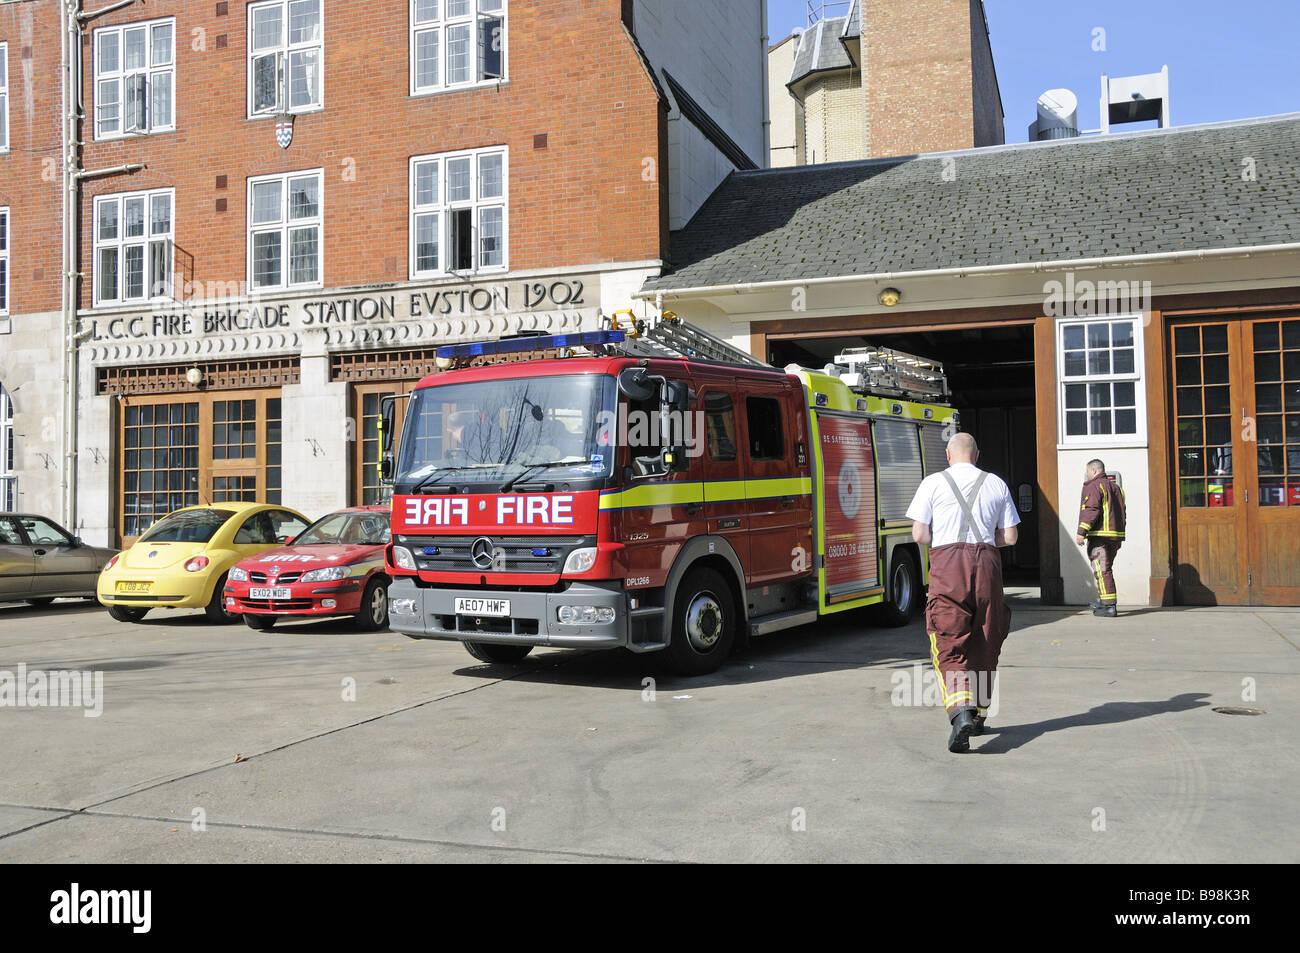 Fire Engine reversing into garage Euston Fire Station London England UK - Stock Image